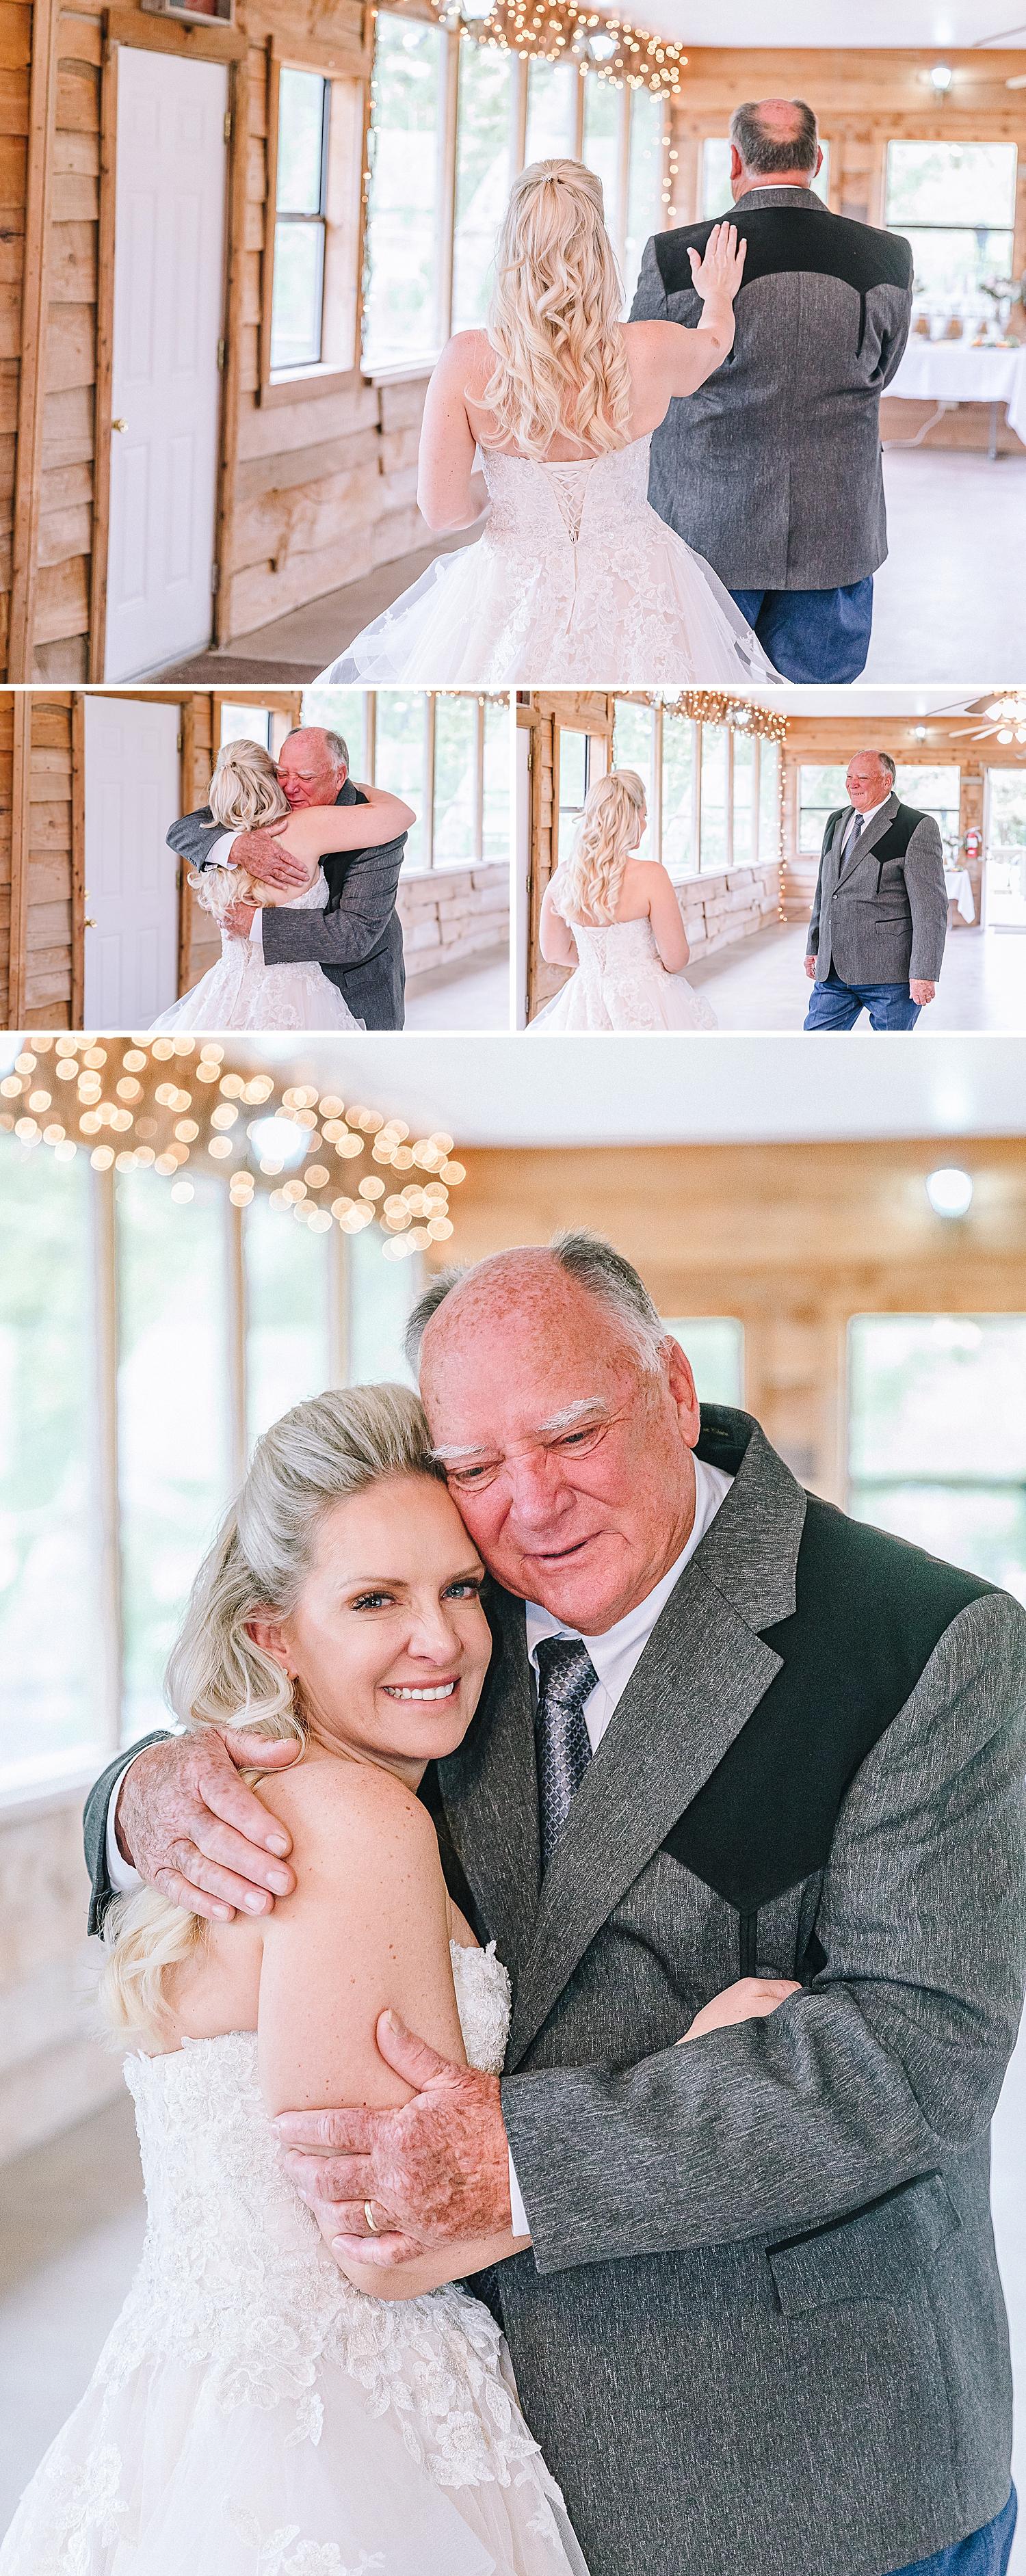 Rio-Cibilo-Ranch-Marion-Texas-Wedding-Rustic-Blush-Rose-Quartz-Details-Carly-Barton-Photography_0019.jpg